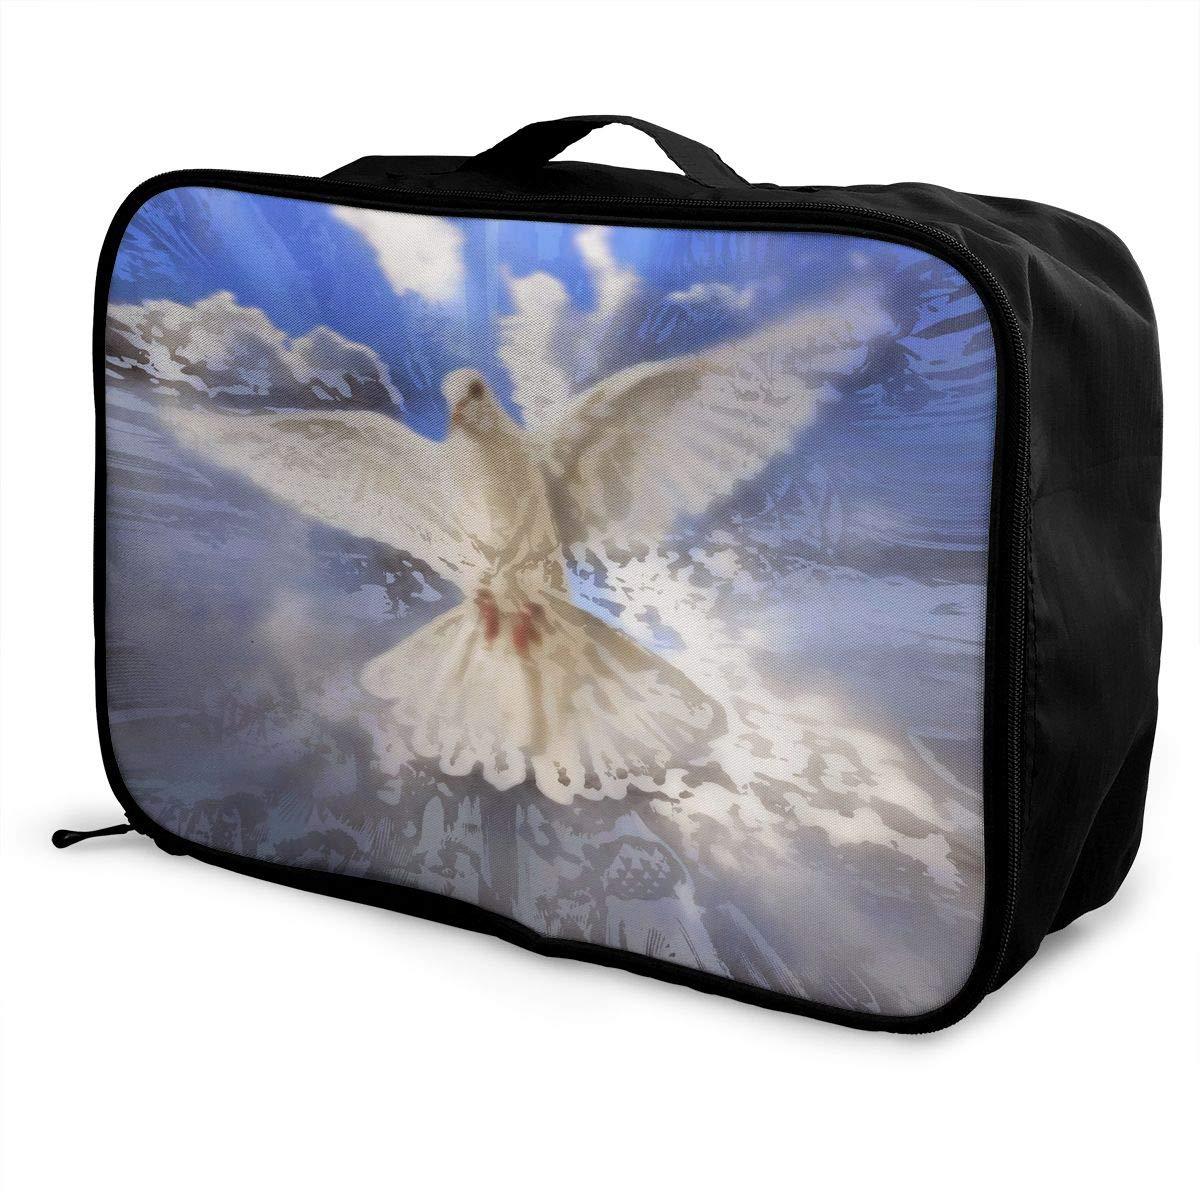 Travel Luggage Duffle Bag Lightweight Portable Handbag Dove Print Large Capacity Waterproof Foldable Storage Tote